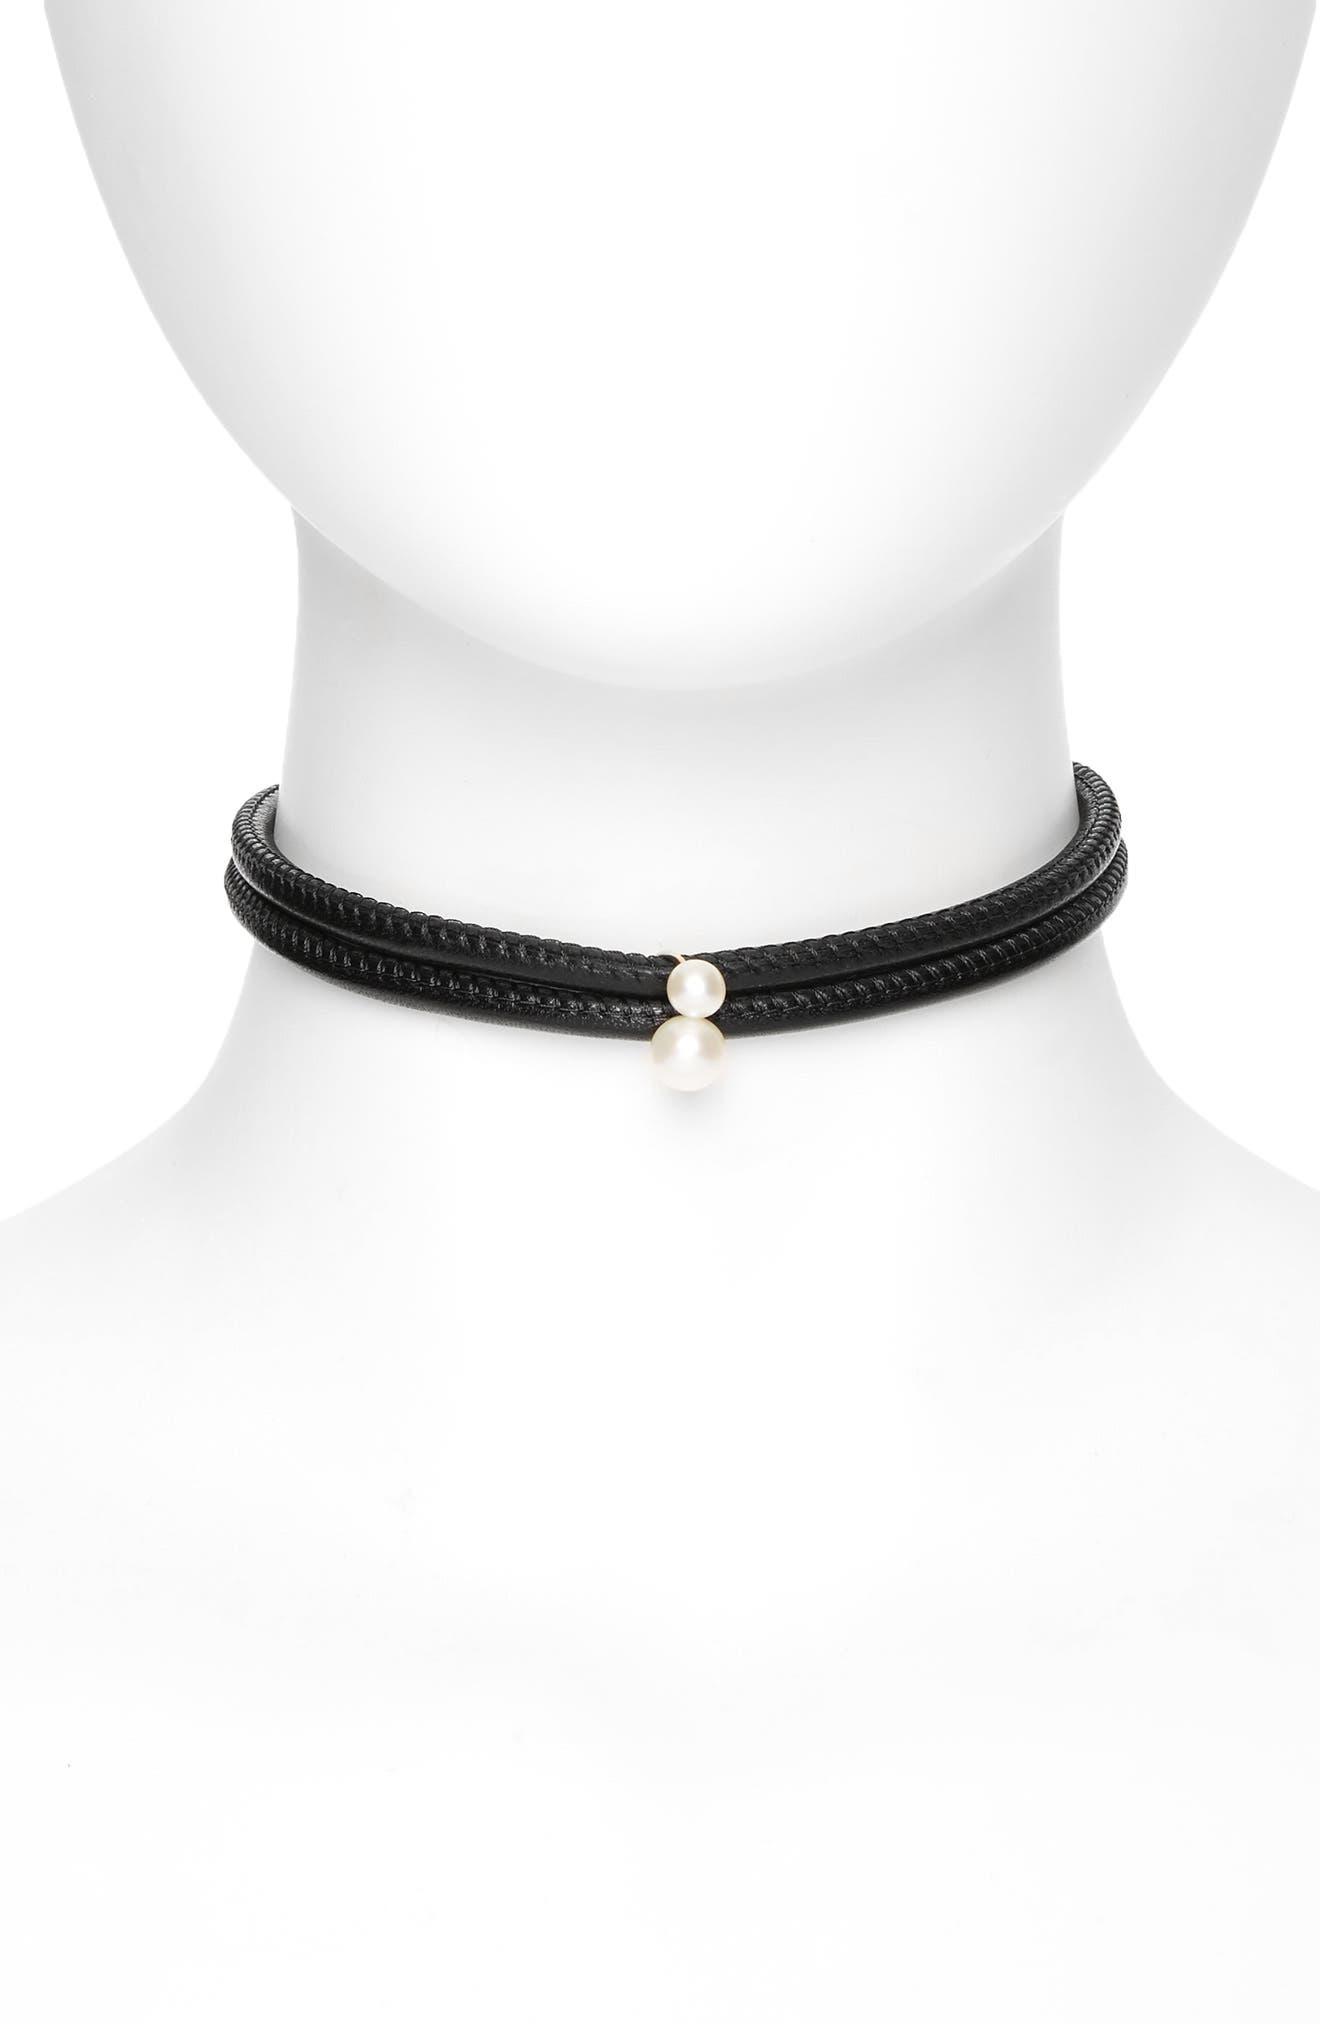 Main Image - Mizuki Leather & Akoya Pearl Choker Necklace